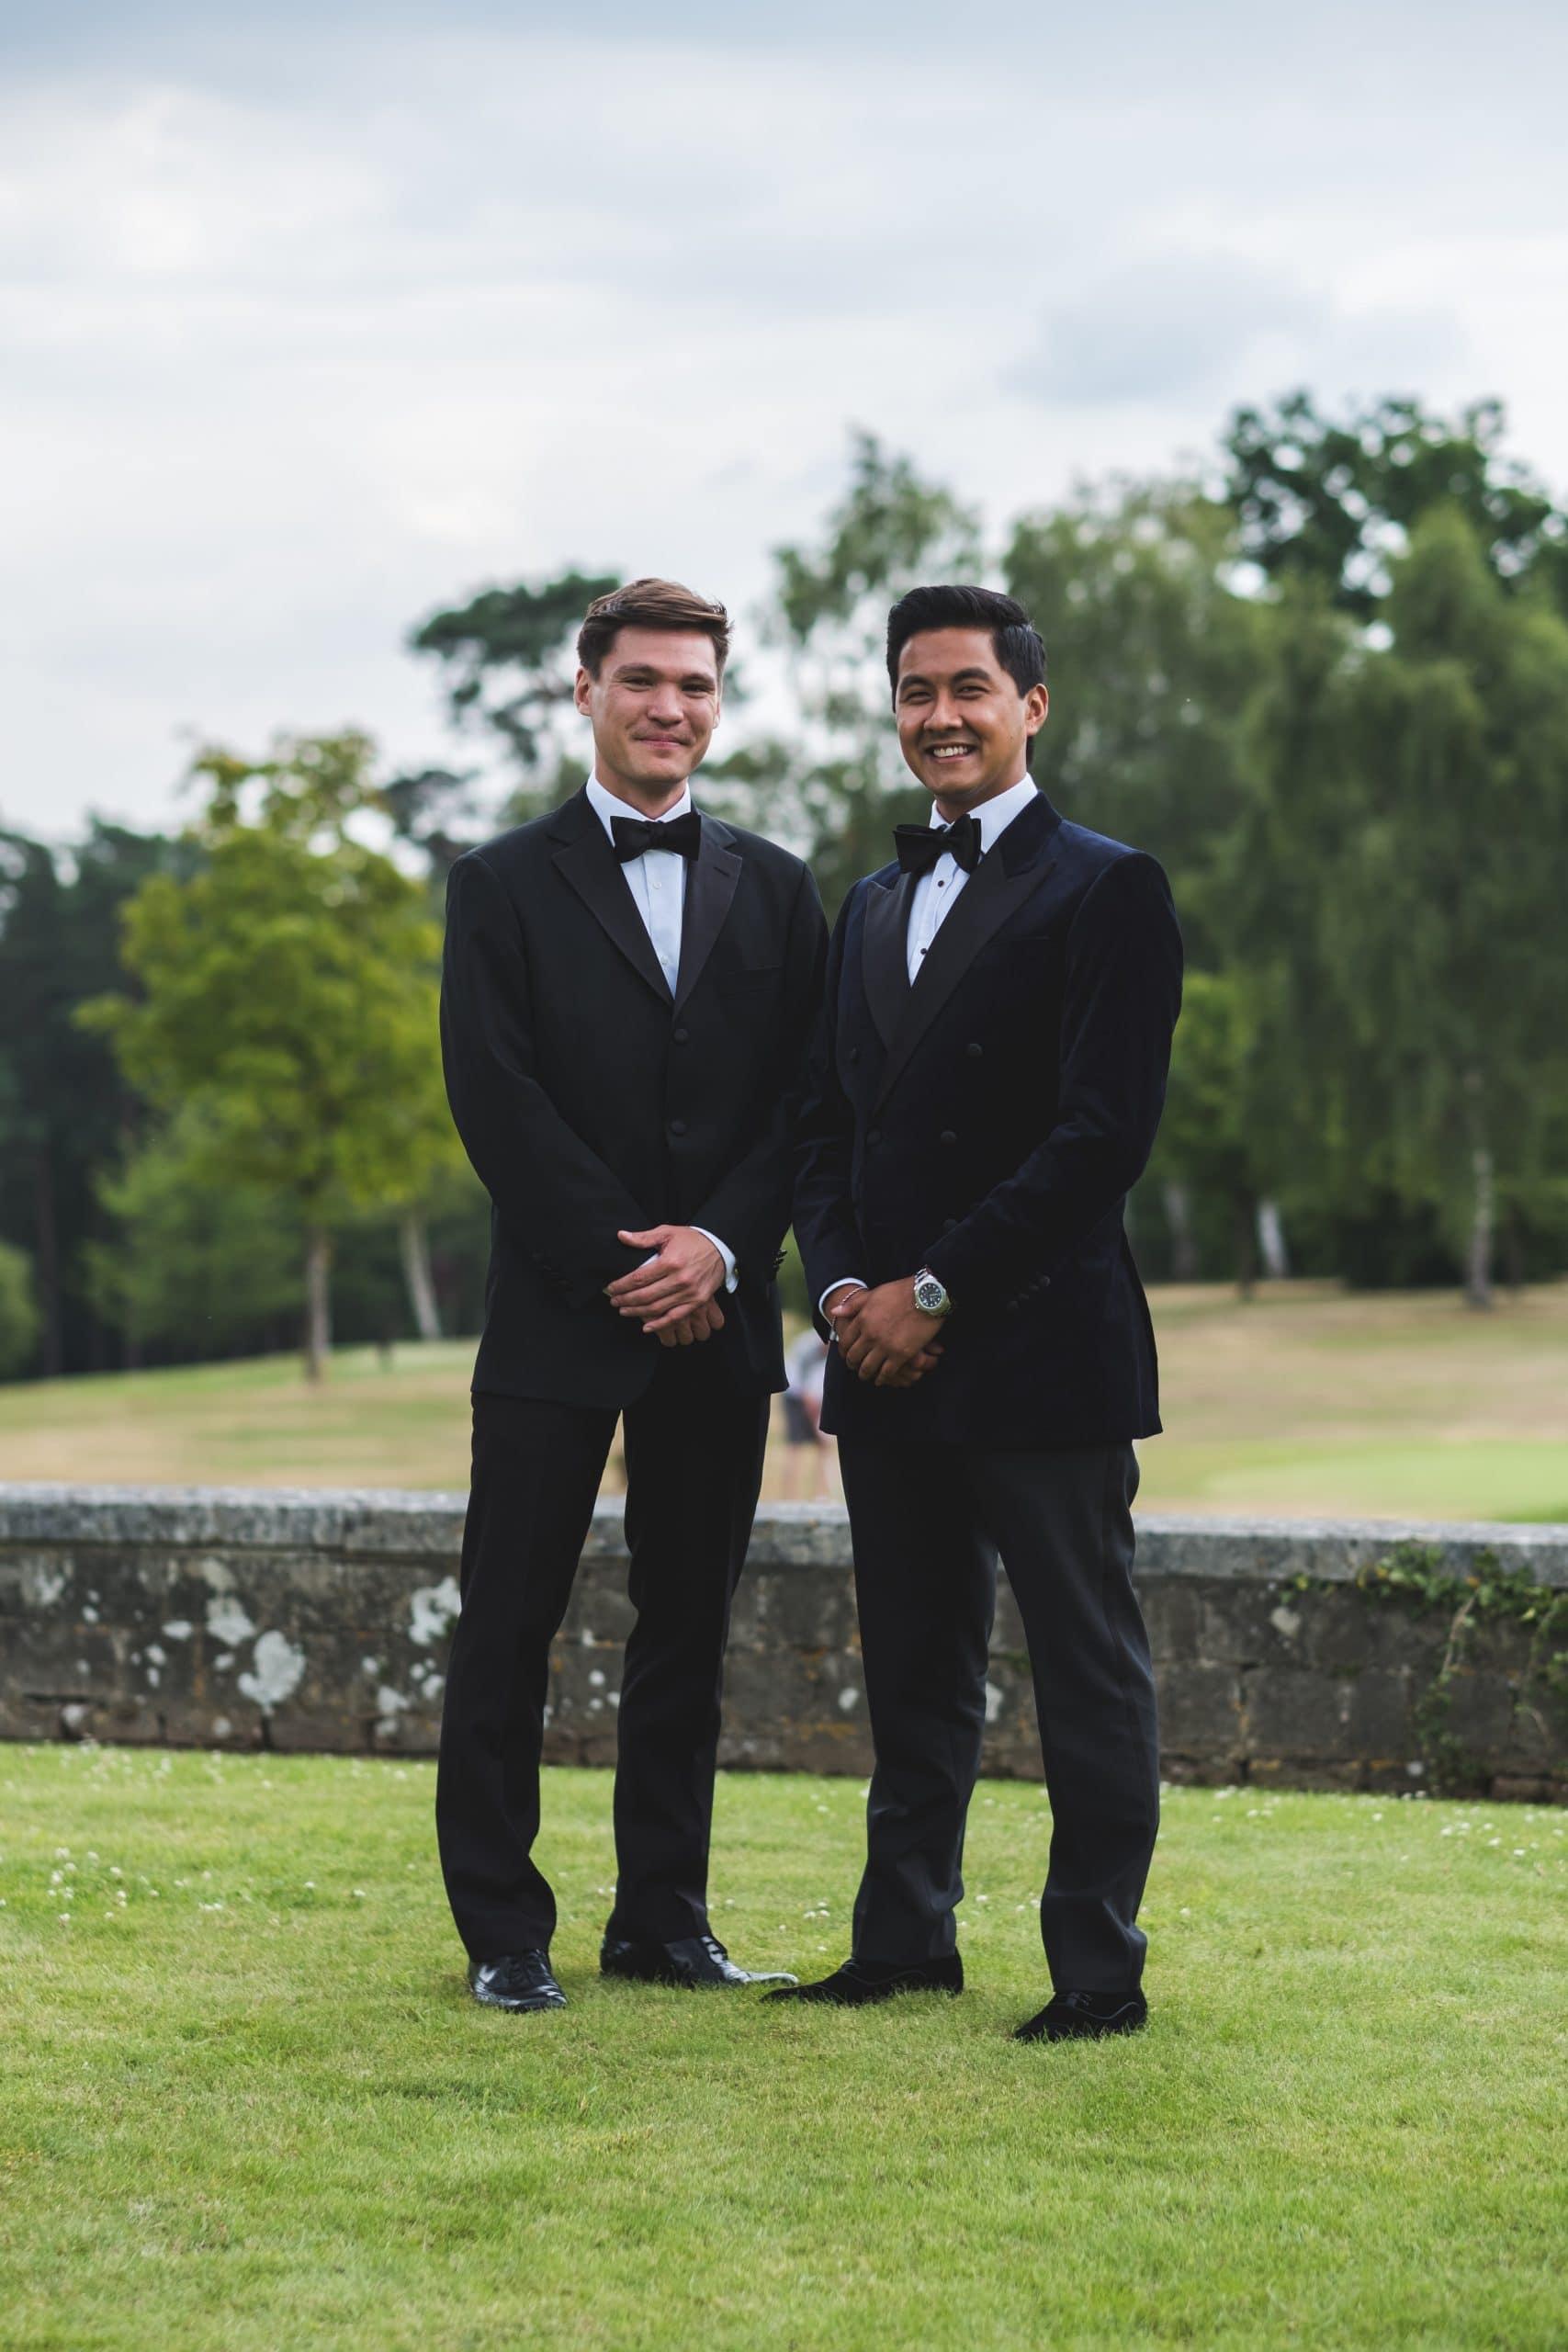 Botleys Mansion wedding photography